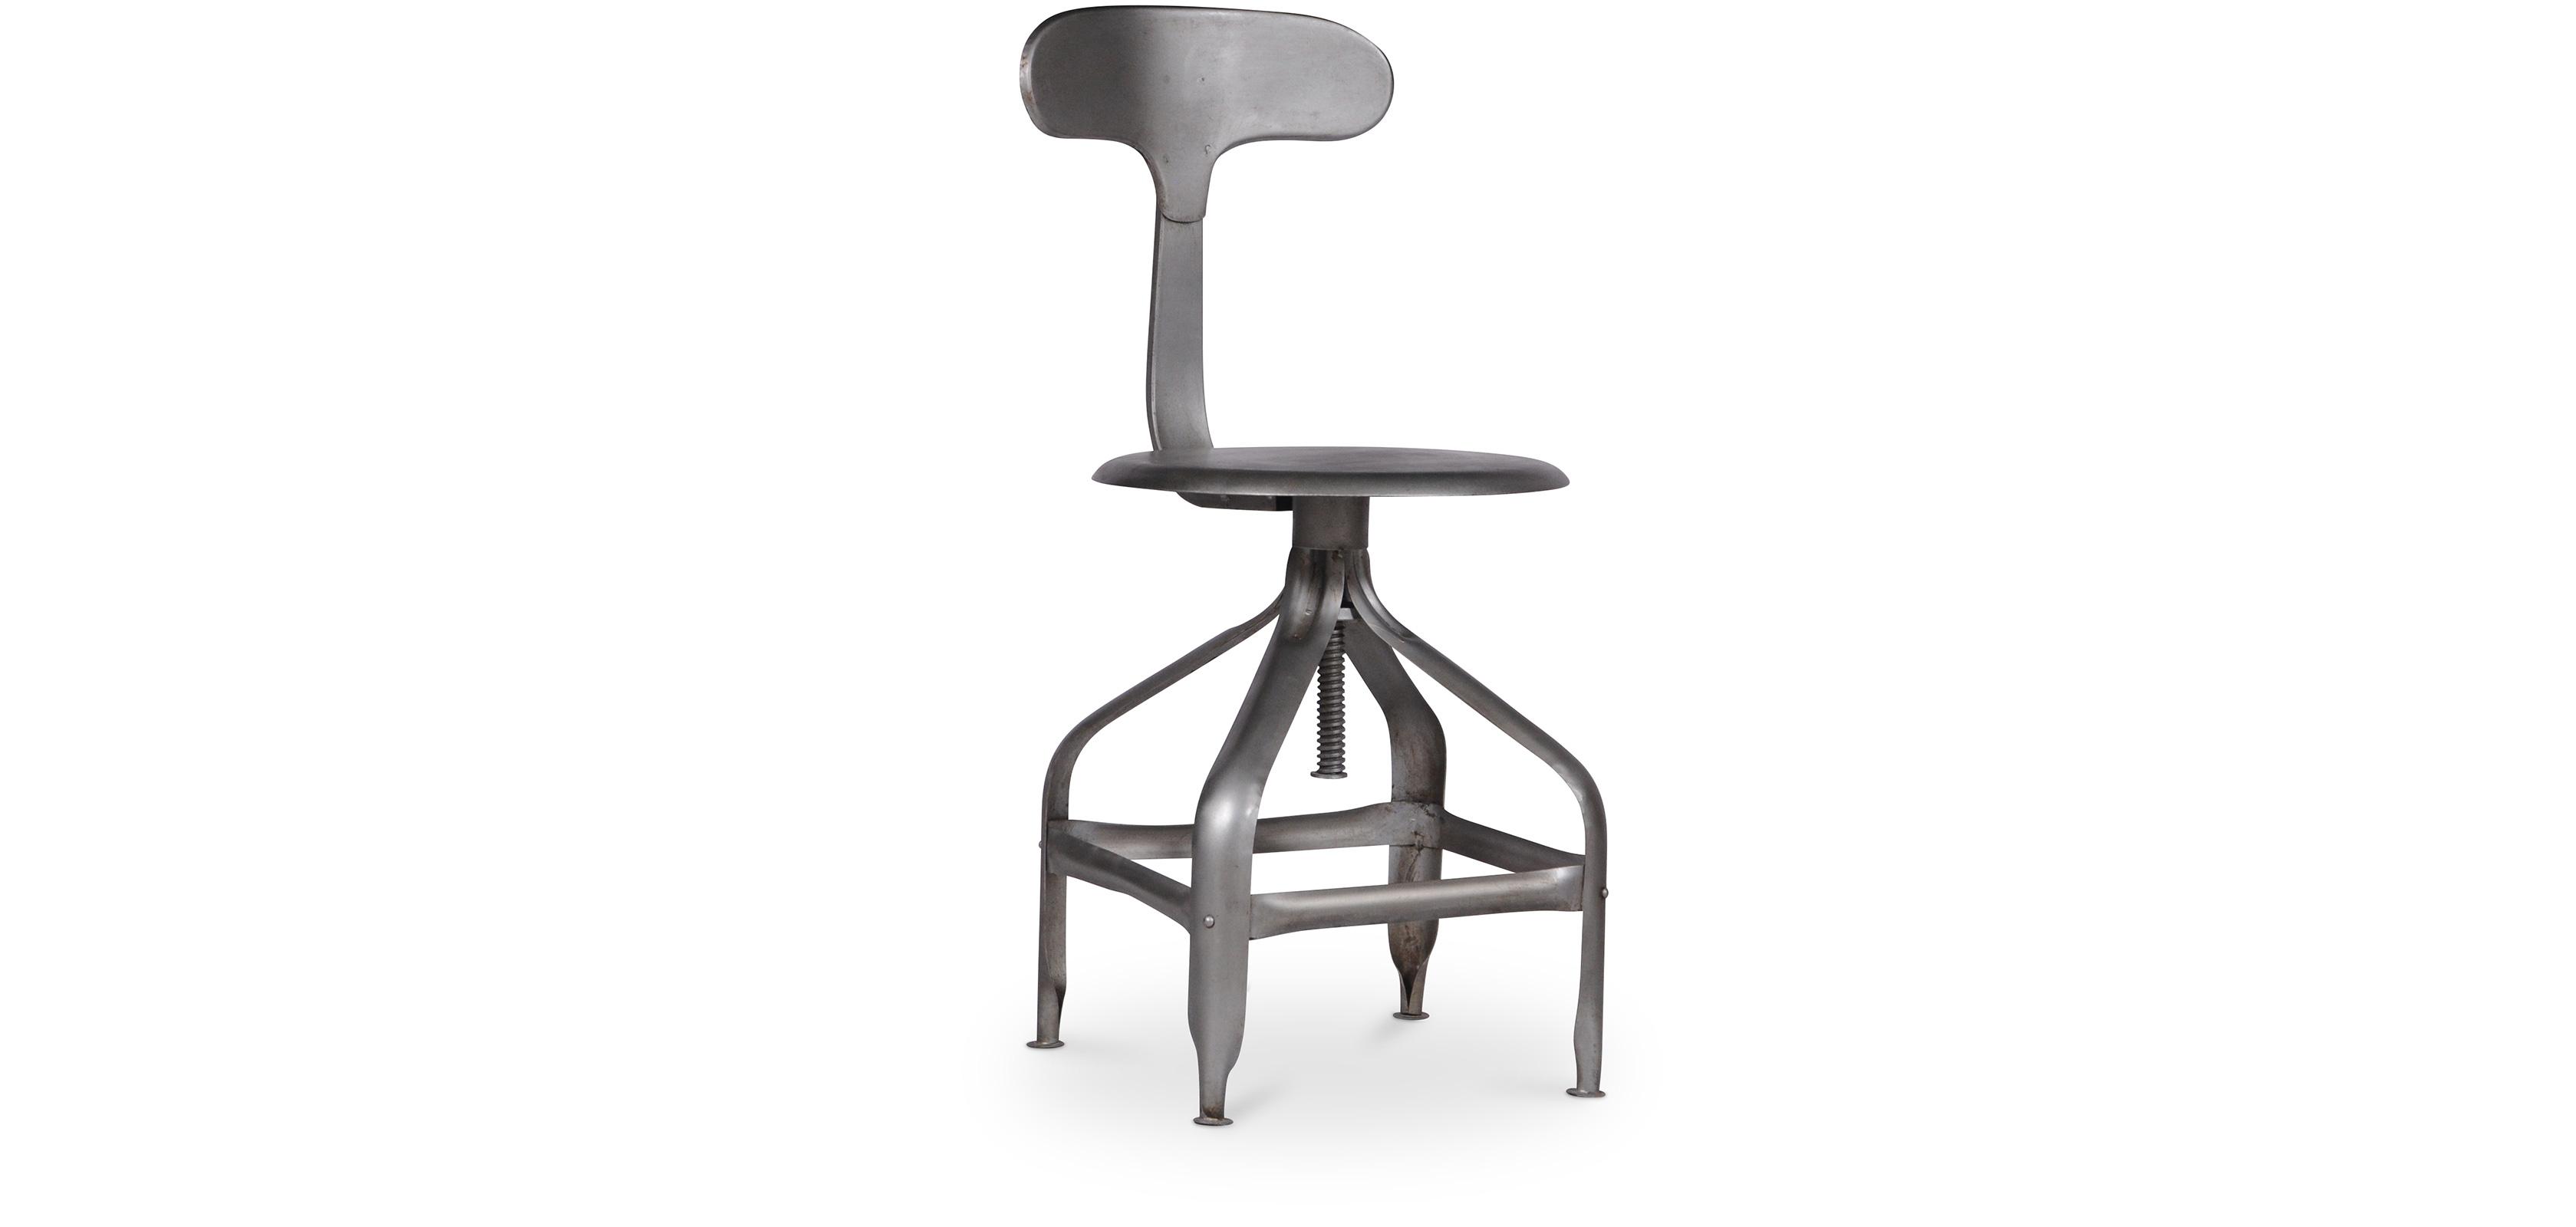 Industrial stuhl metall for Design stuhl metall